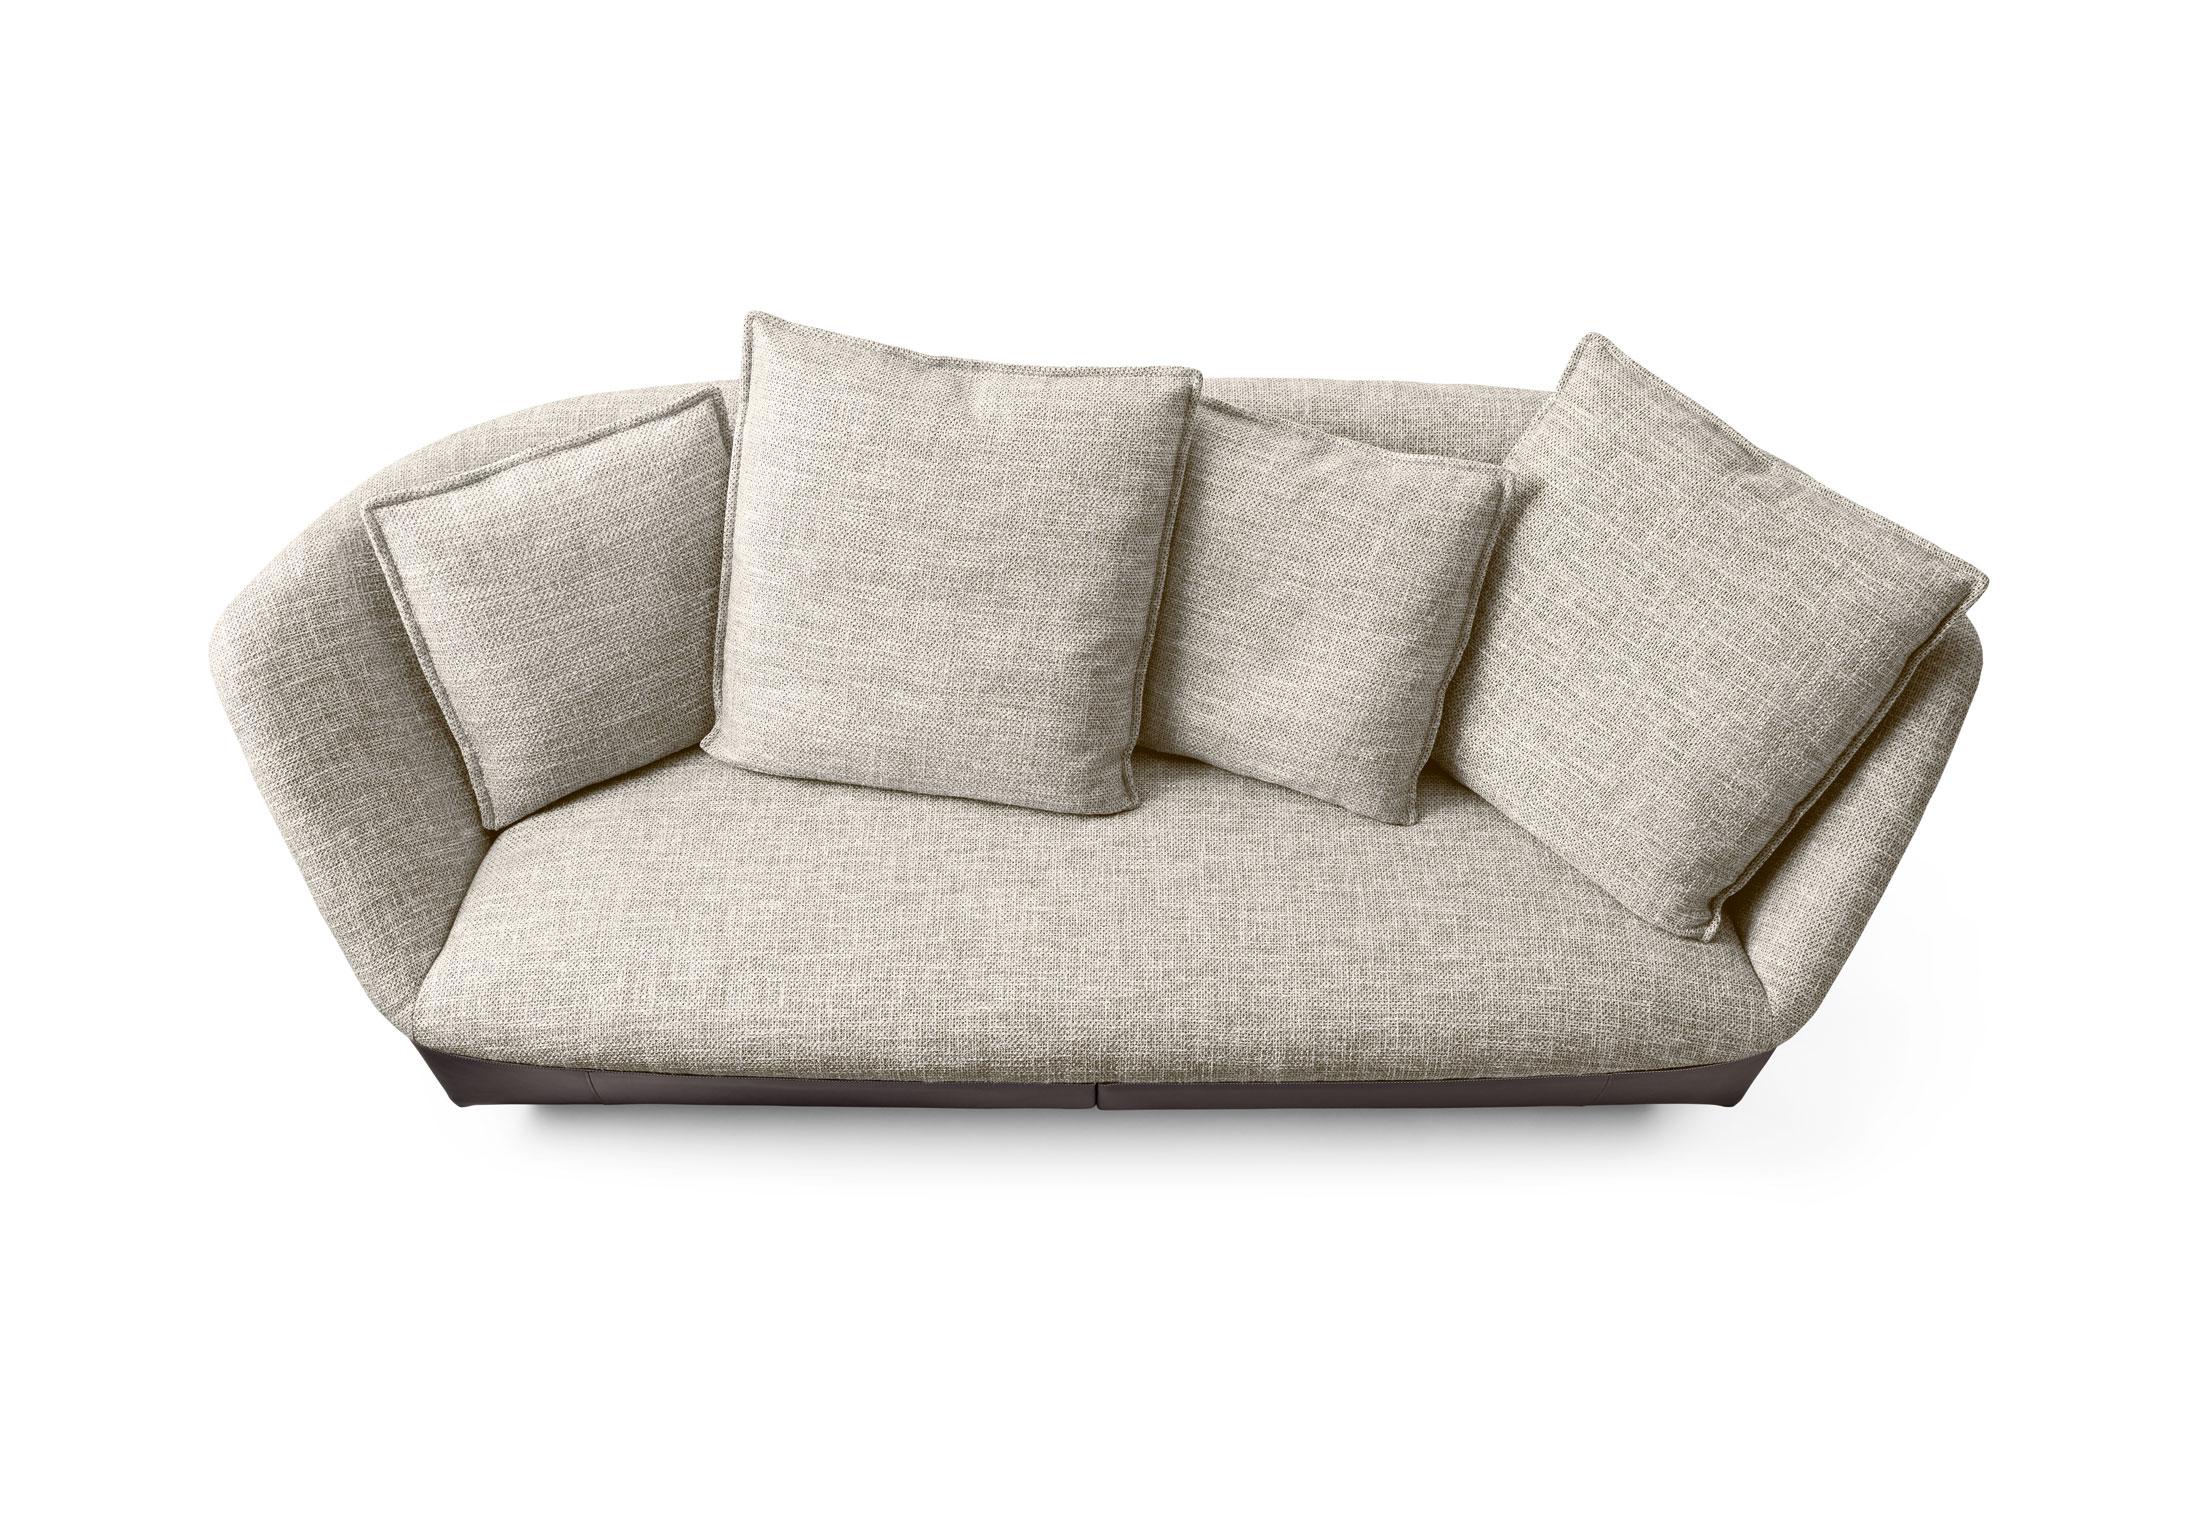 Isanka sofa by eoos for walter knoll sohomod blog isanka sofa by eoos for walter knoll parisarafo Gallery